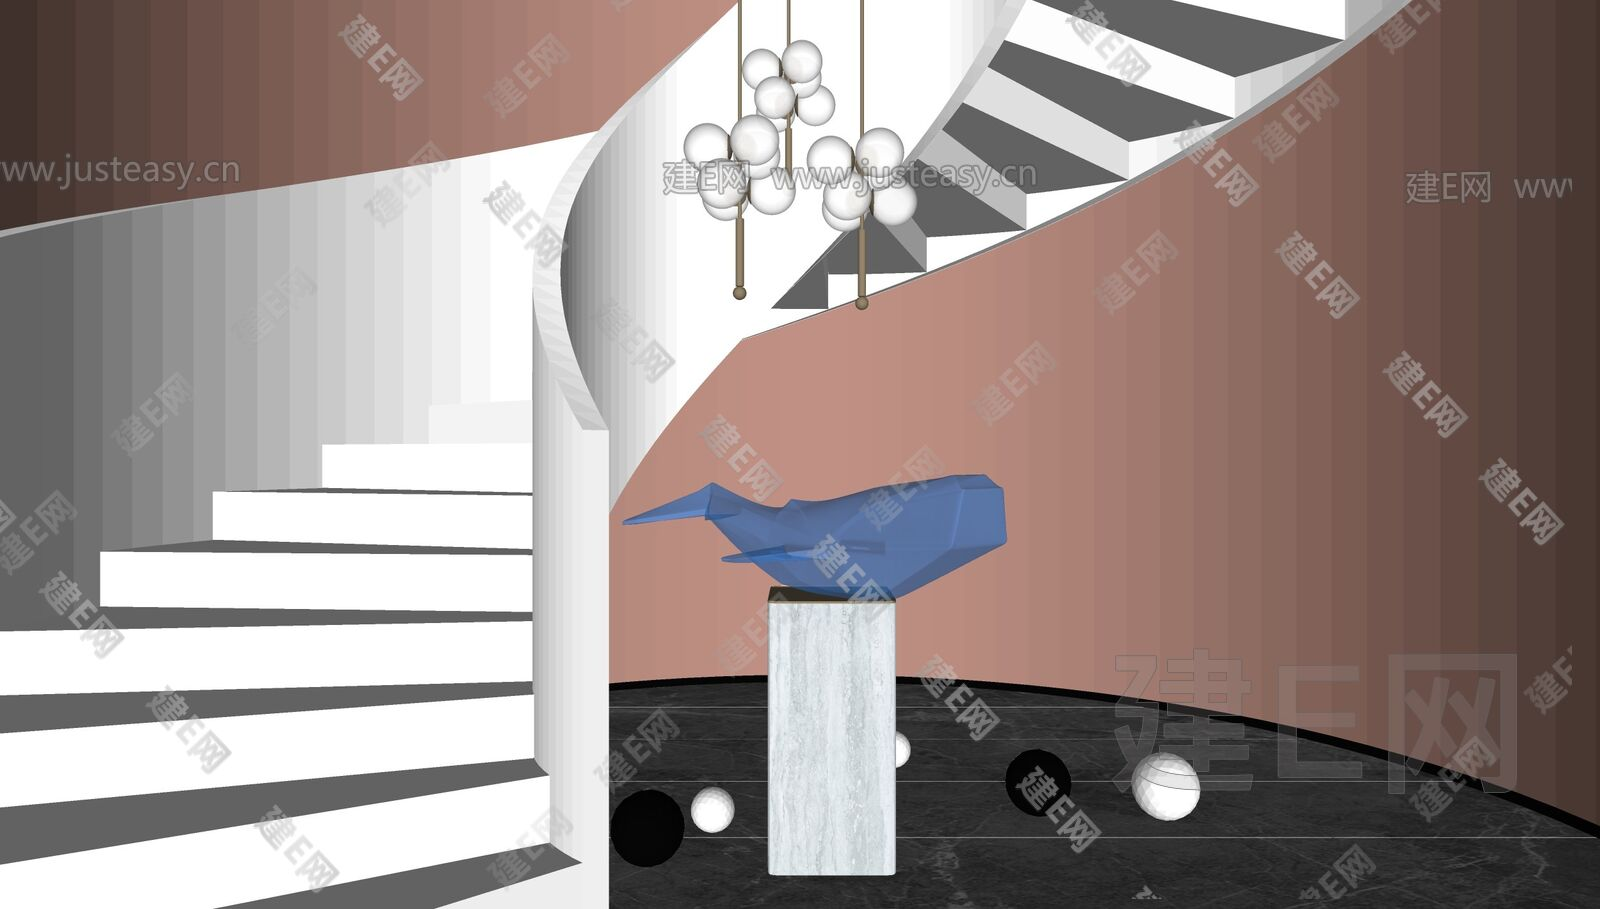 现代楼梯雕塑 sketchup模型